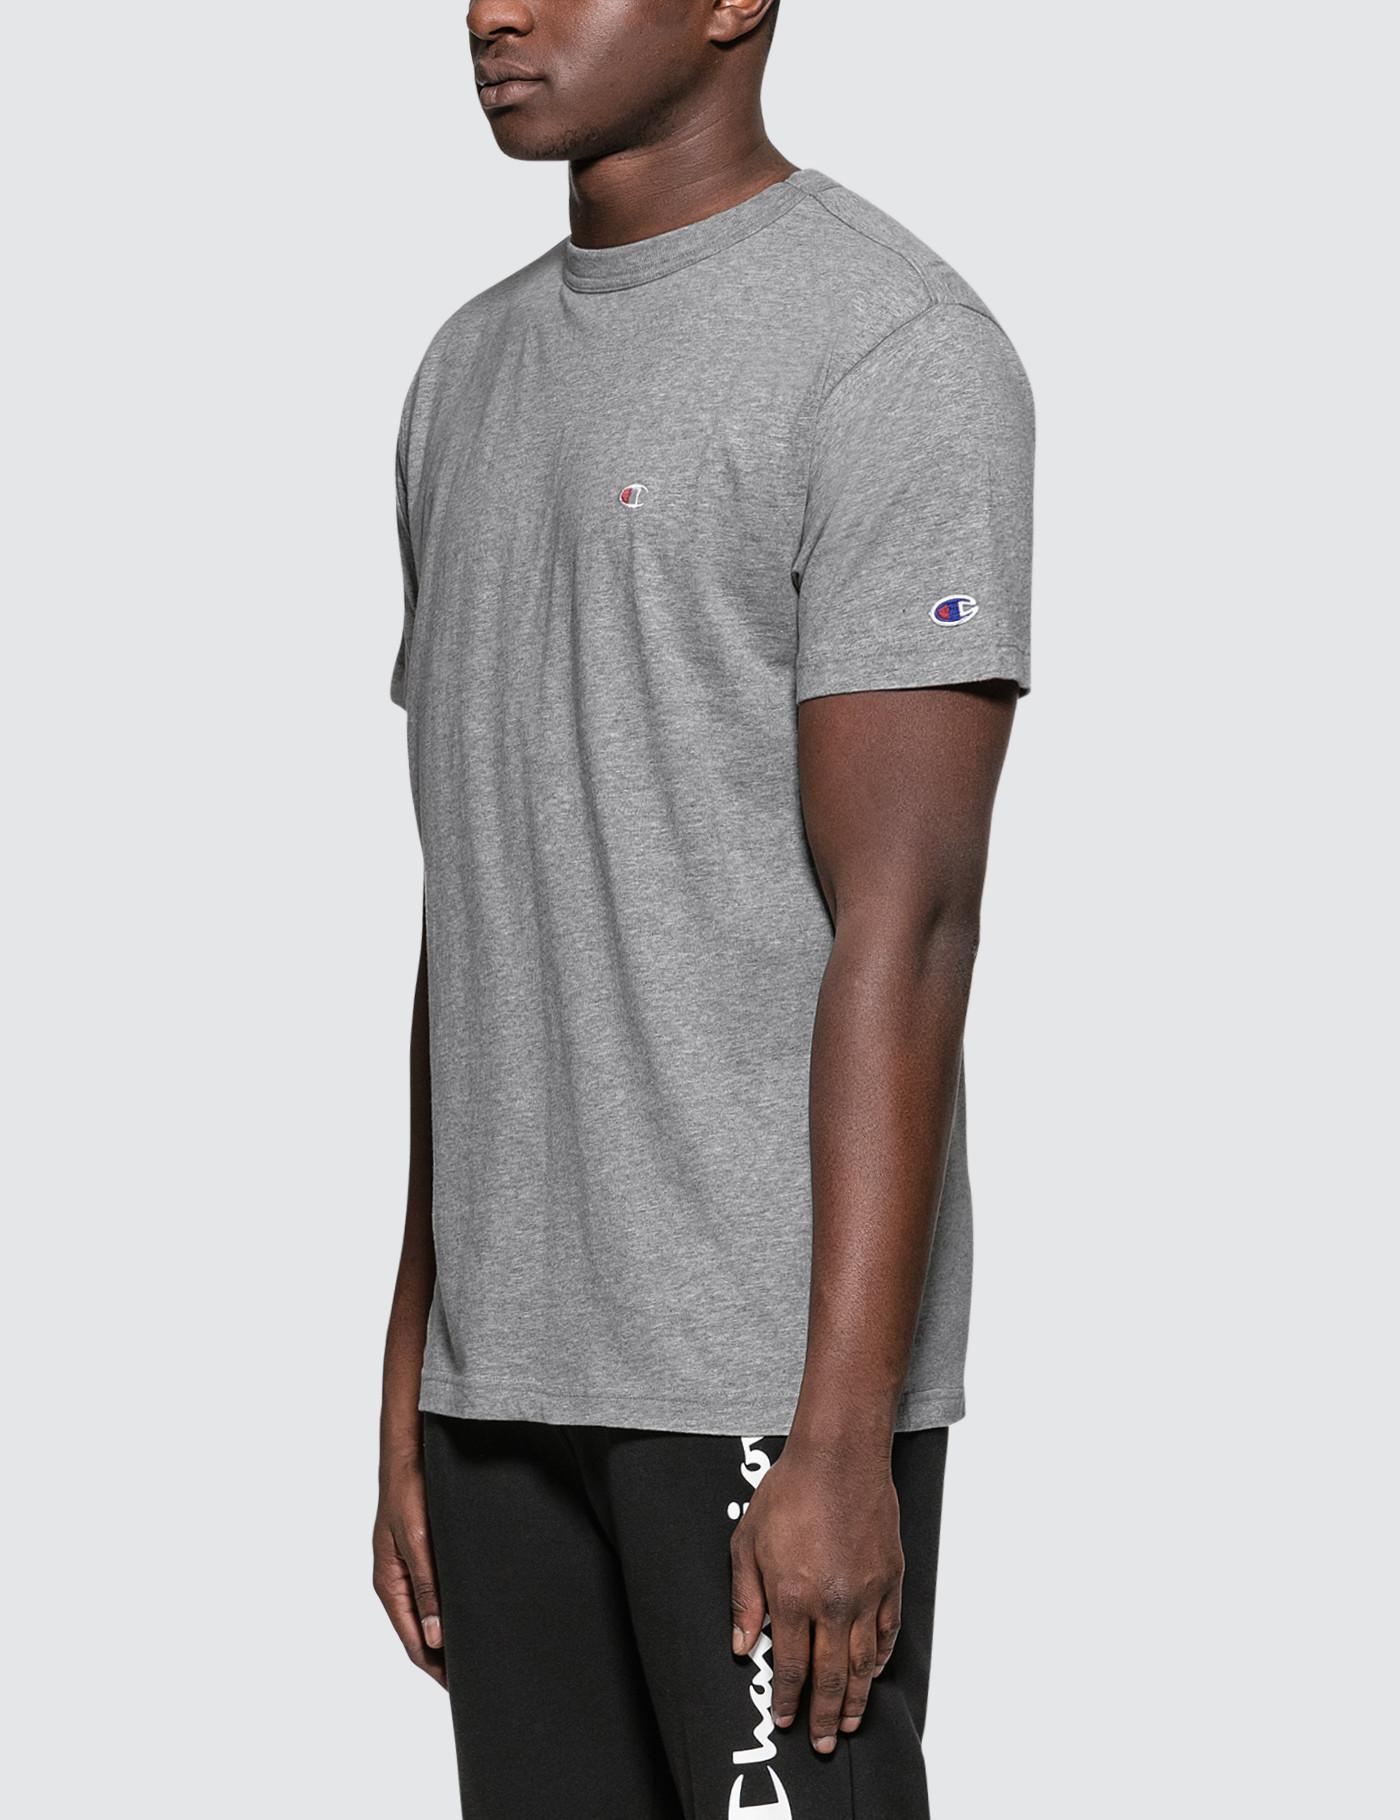 fd6bb78de277 Champion Small Logo S/s T-shirt in Gray for Men - Lyst